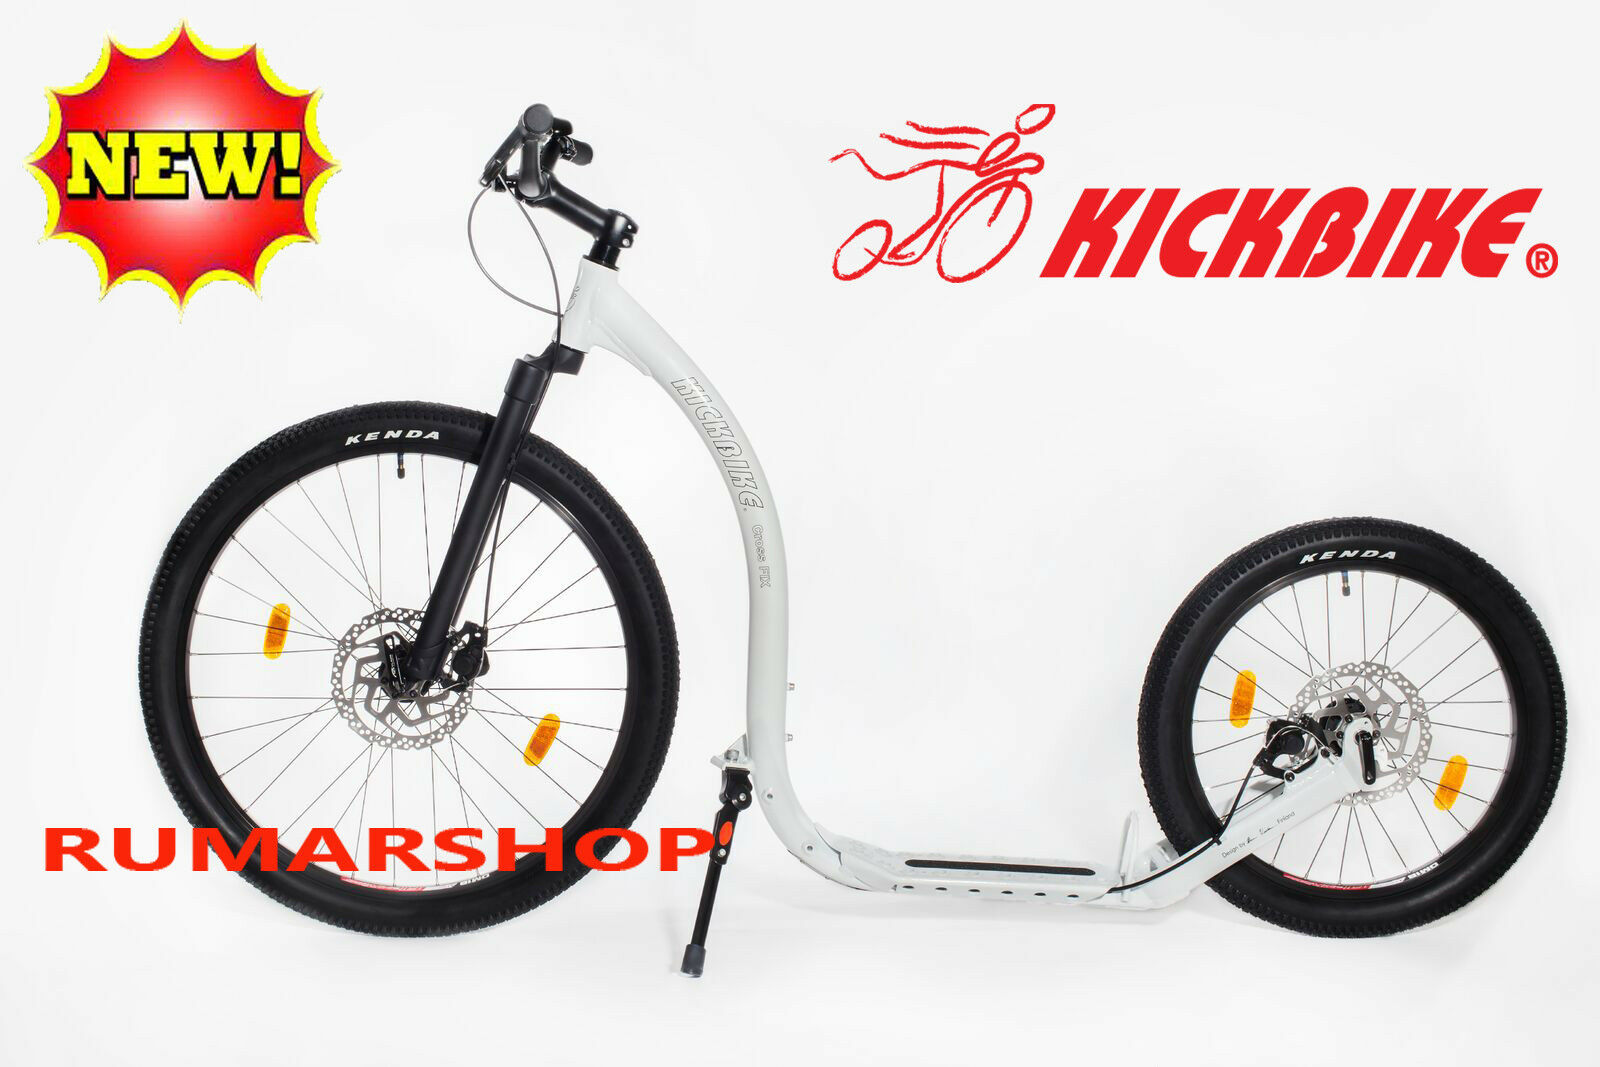 Nuevo original kickbike  Cross fix blanco scooter Roller  garantía de crédito